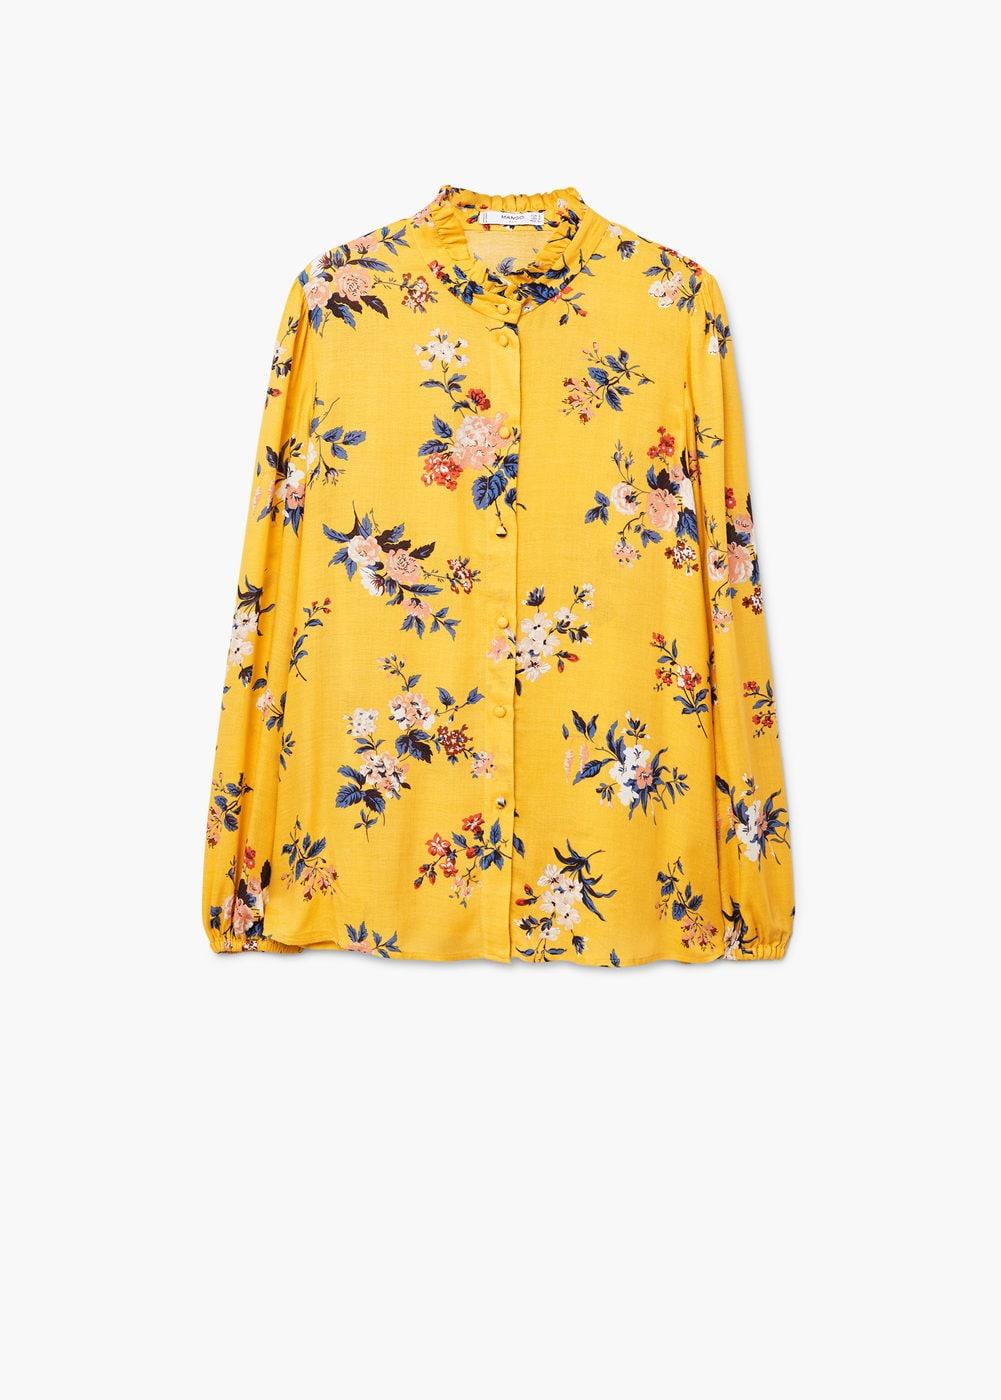 Top, £35.99, Mango